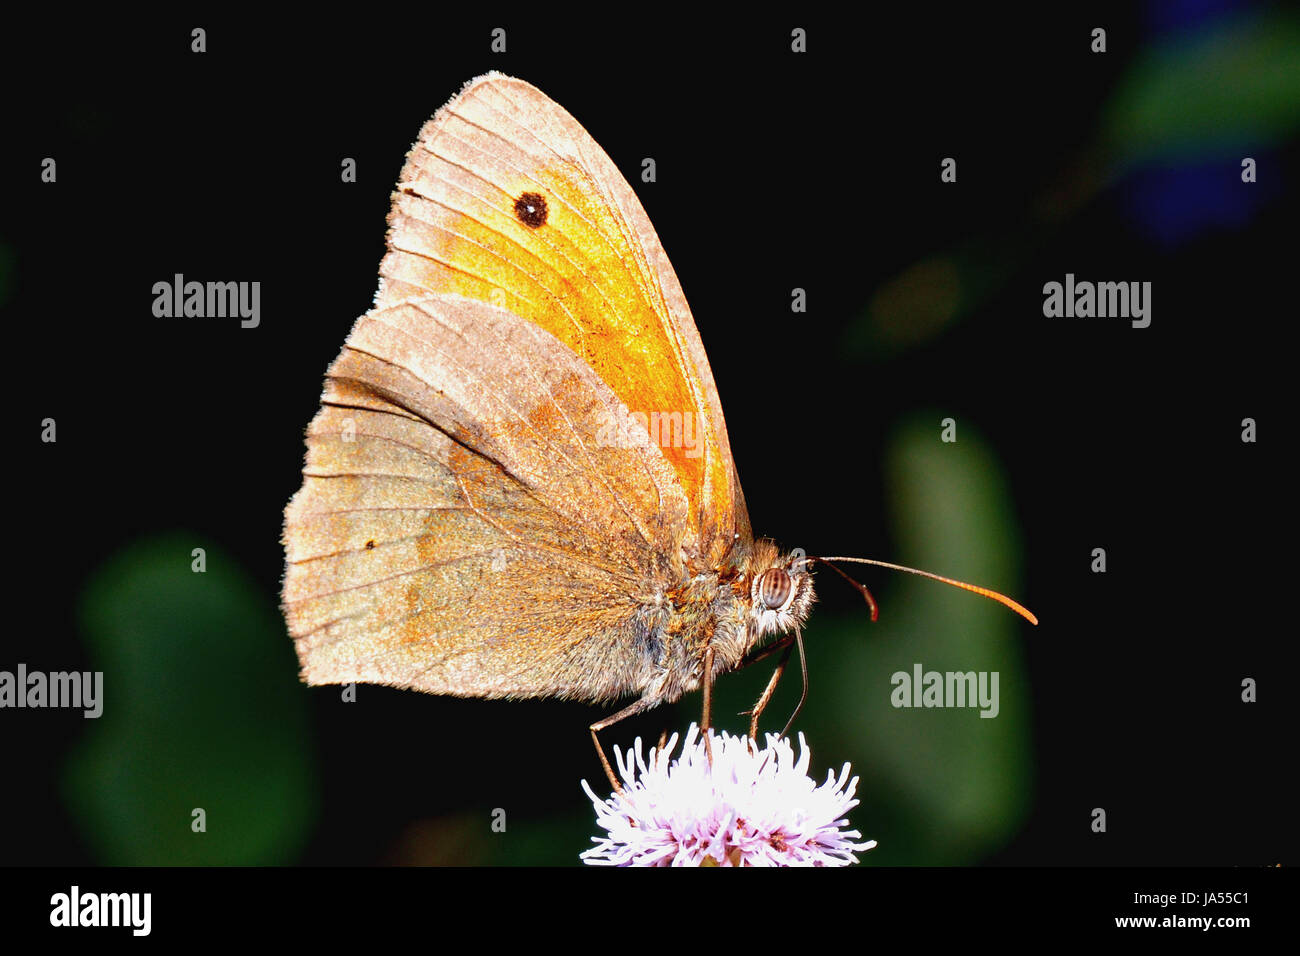 small heufalter on blossom - Stock Image